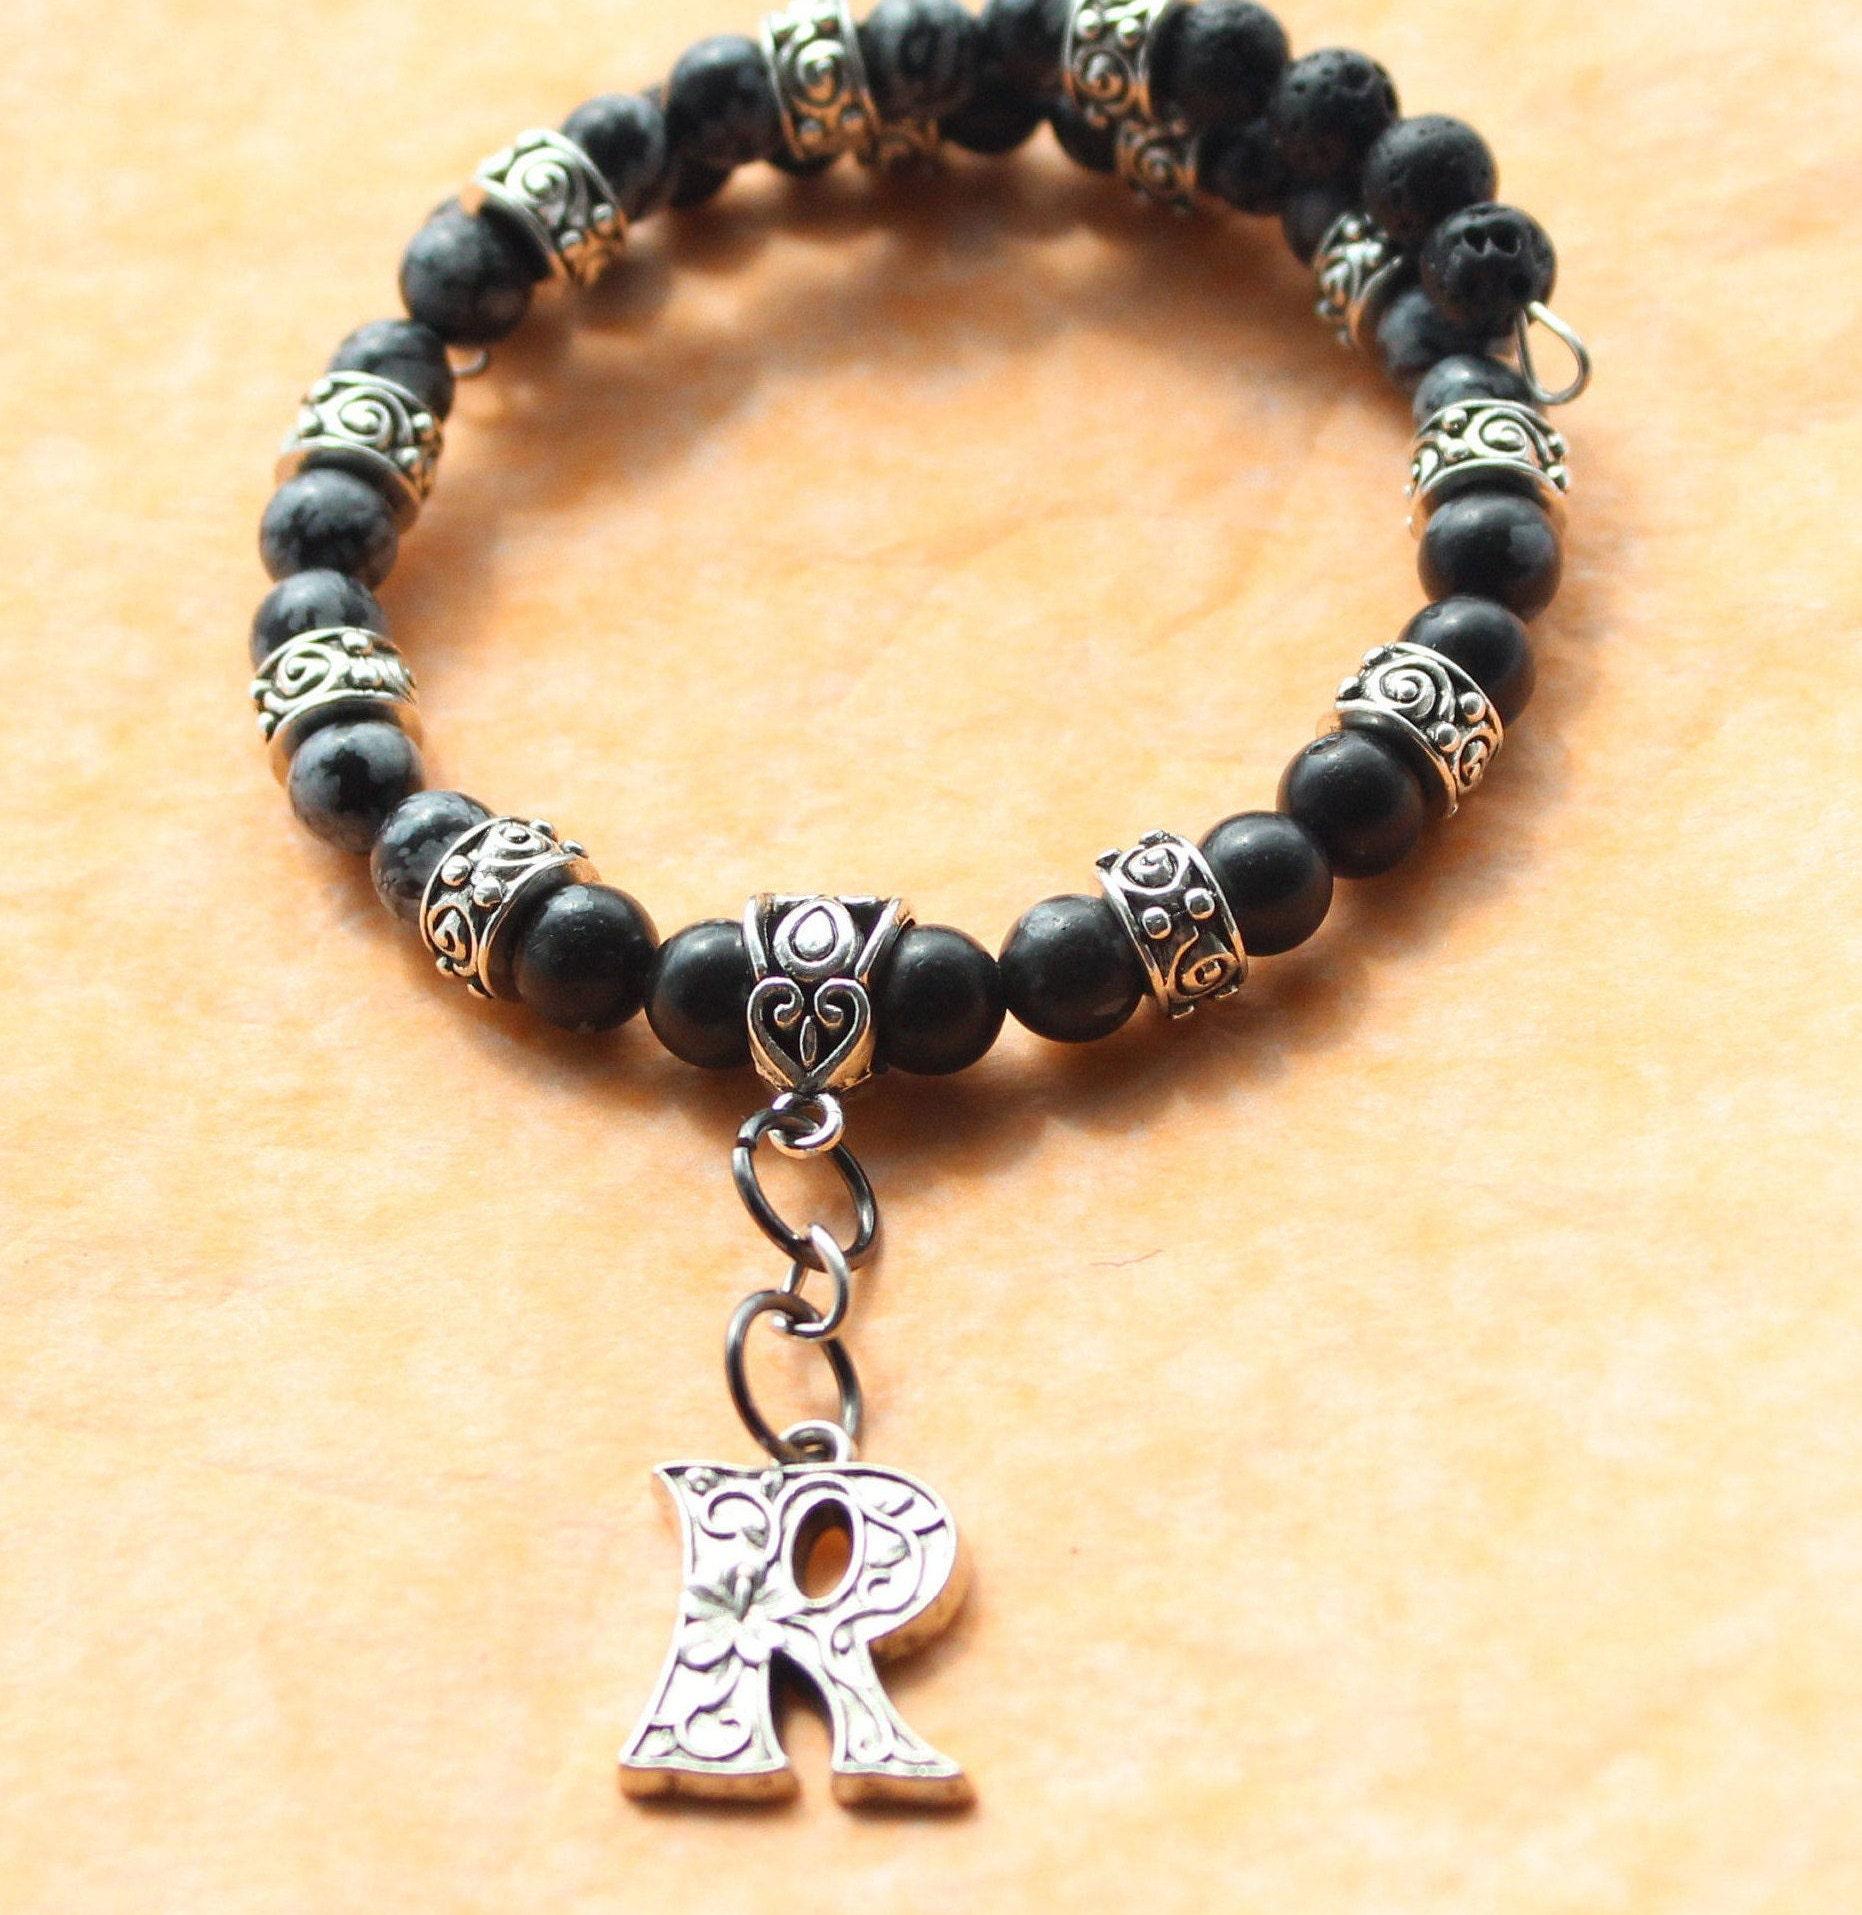 Personalized Lava Bead Bracelet Custom Friendship Bracelets